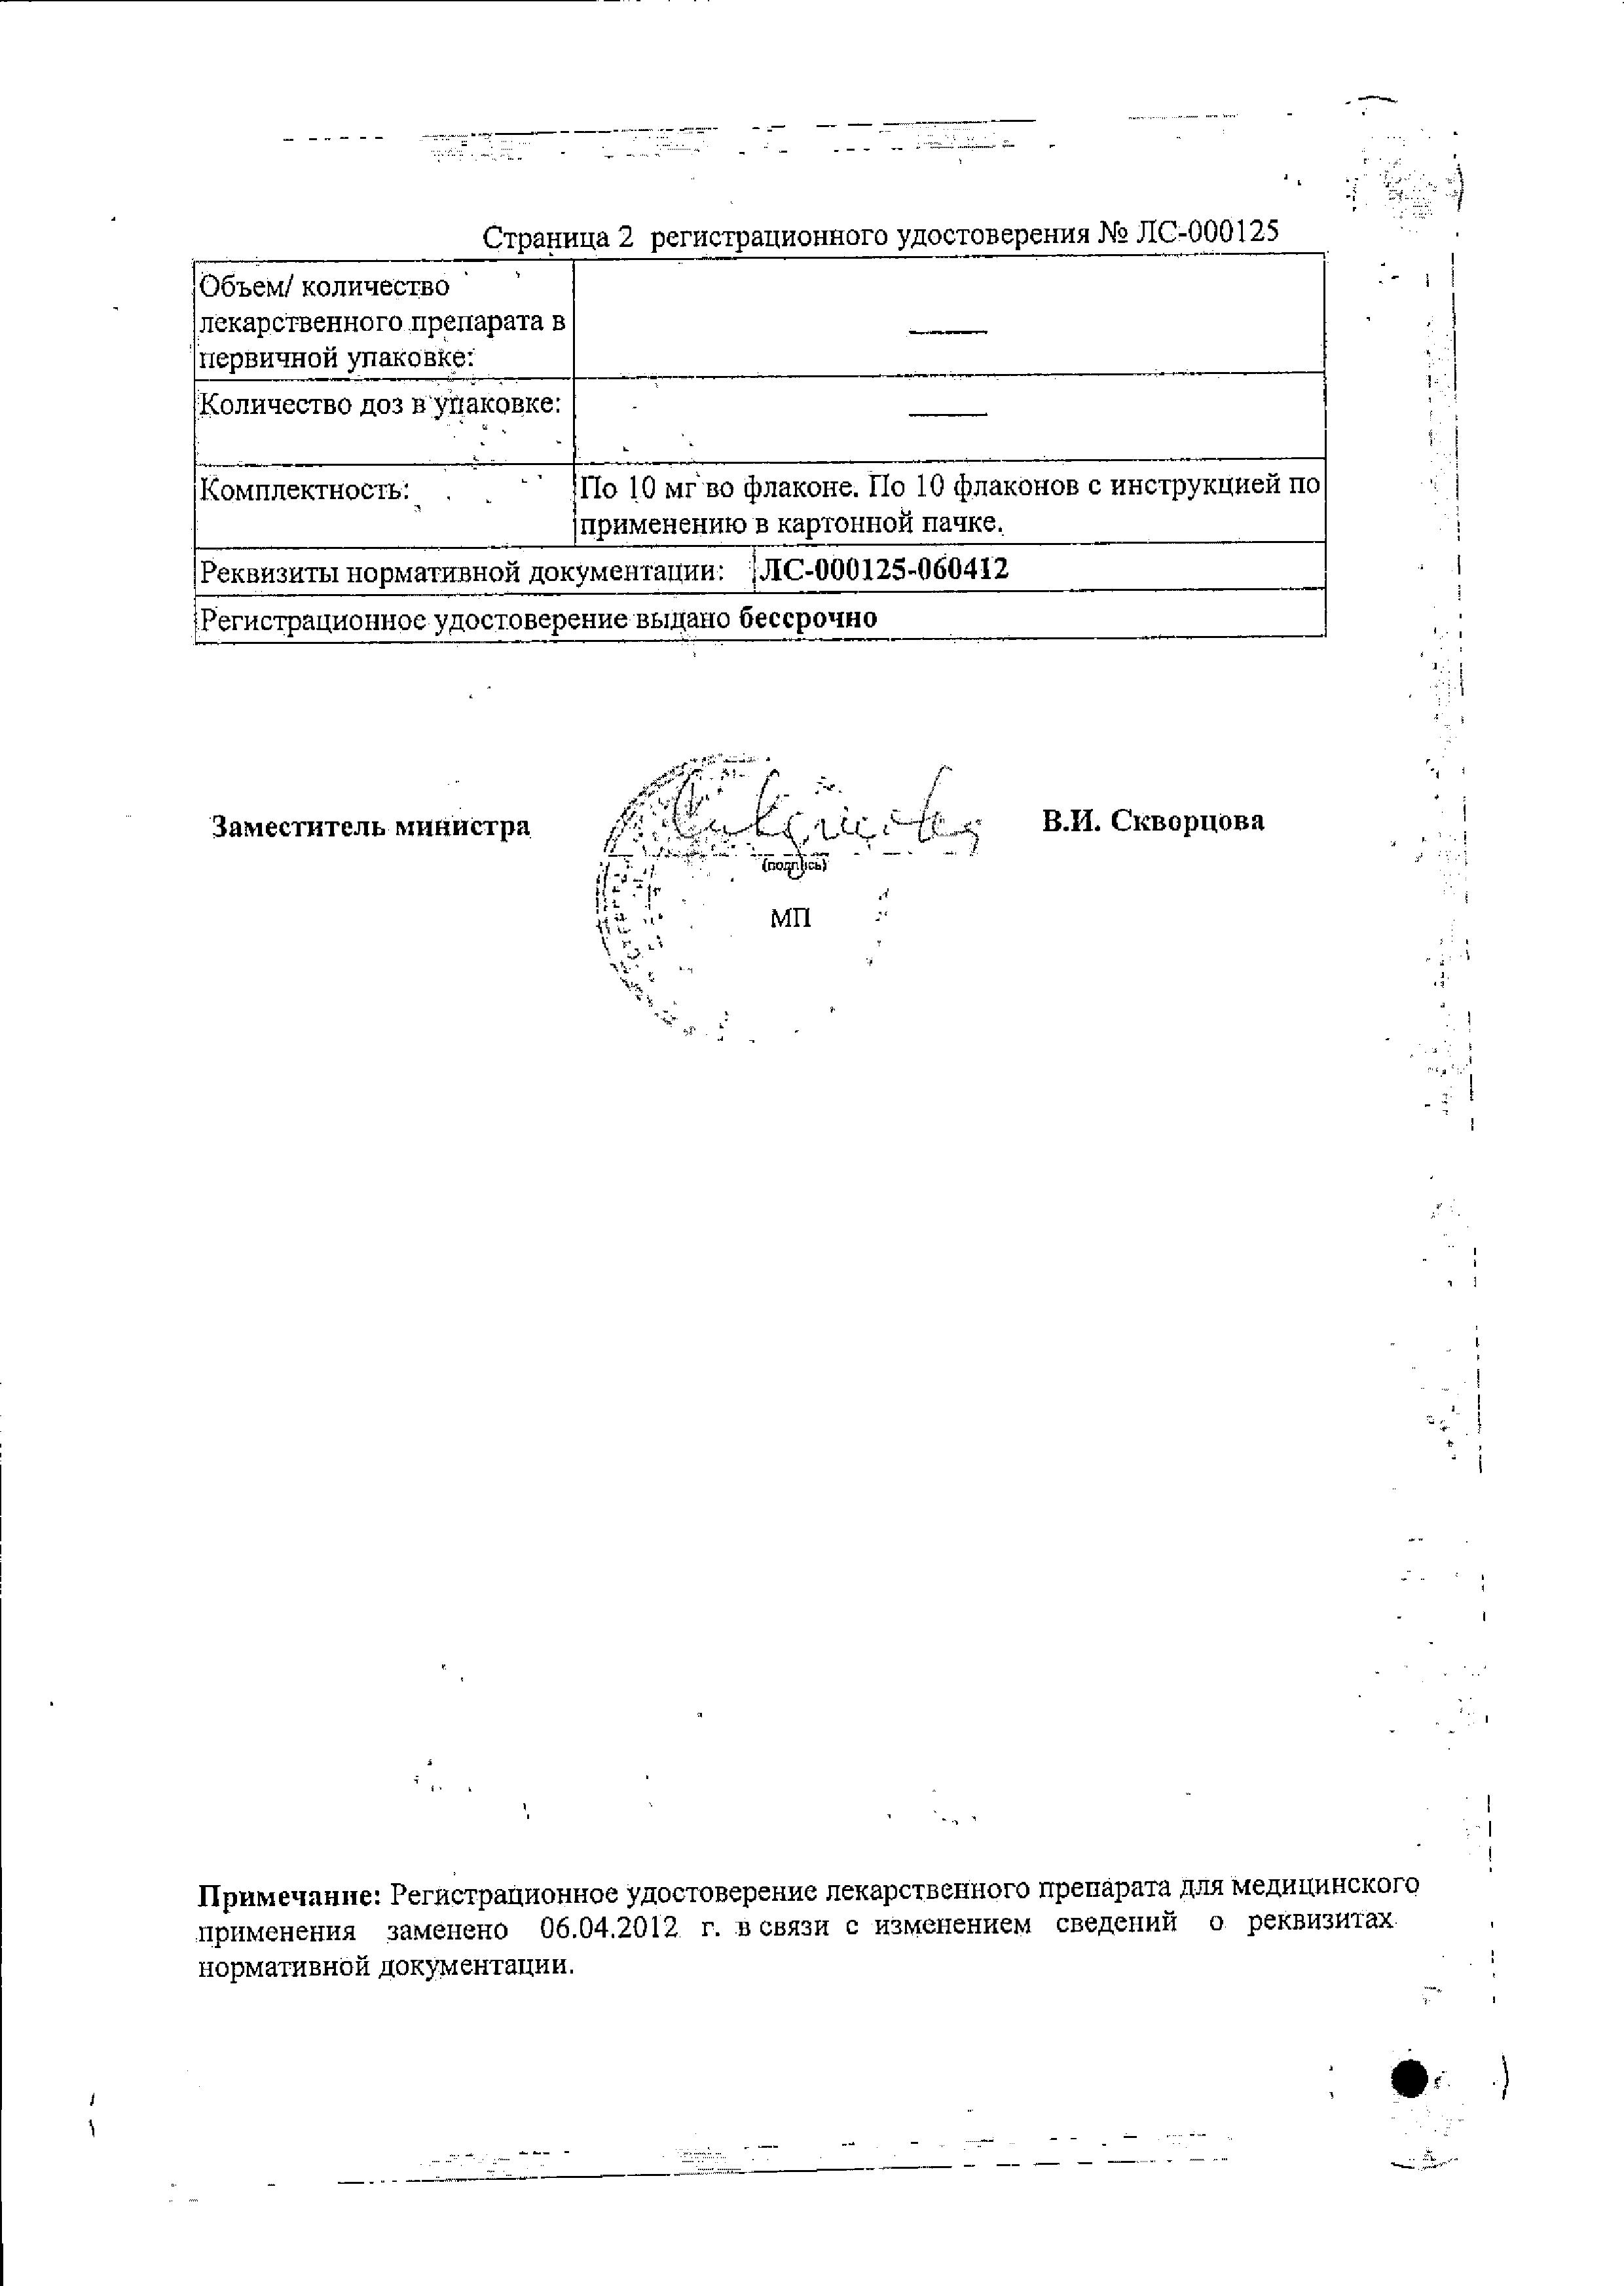 Химотрипсин сертификат